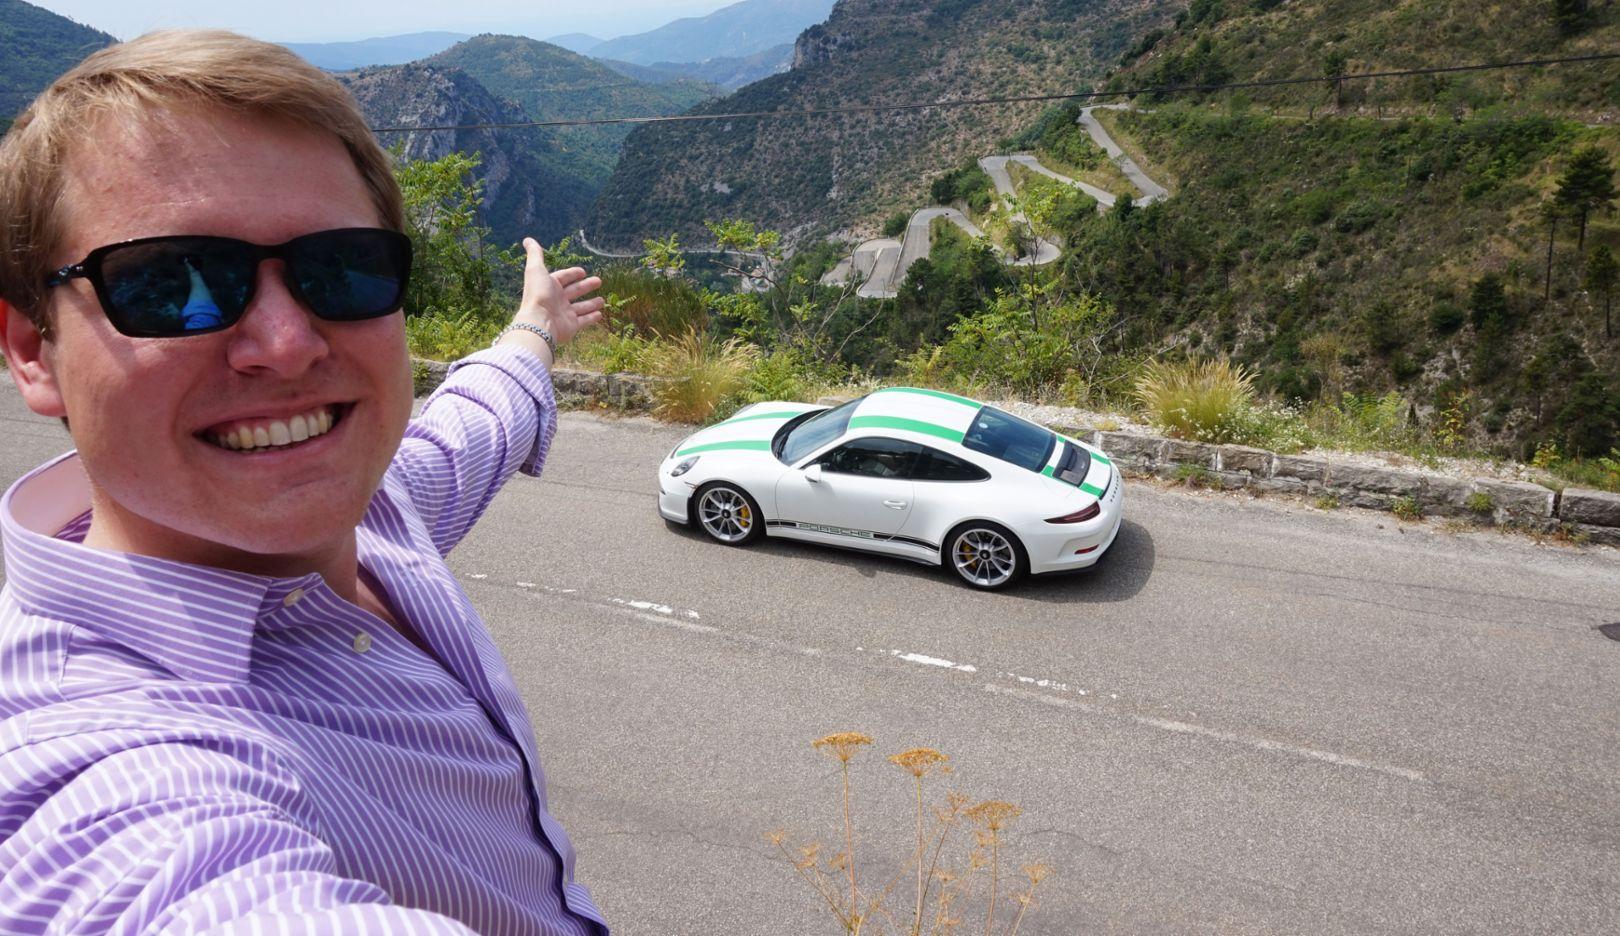 Shmee150, Tim Burton, YouTuber, 911 R, Porsche Ultimate – Drive & Experience, Col de Turini, 2017, Porsche AG